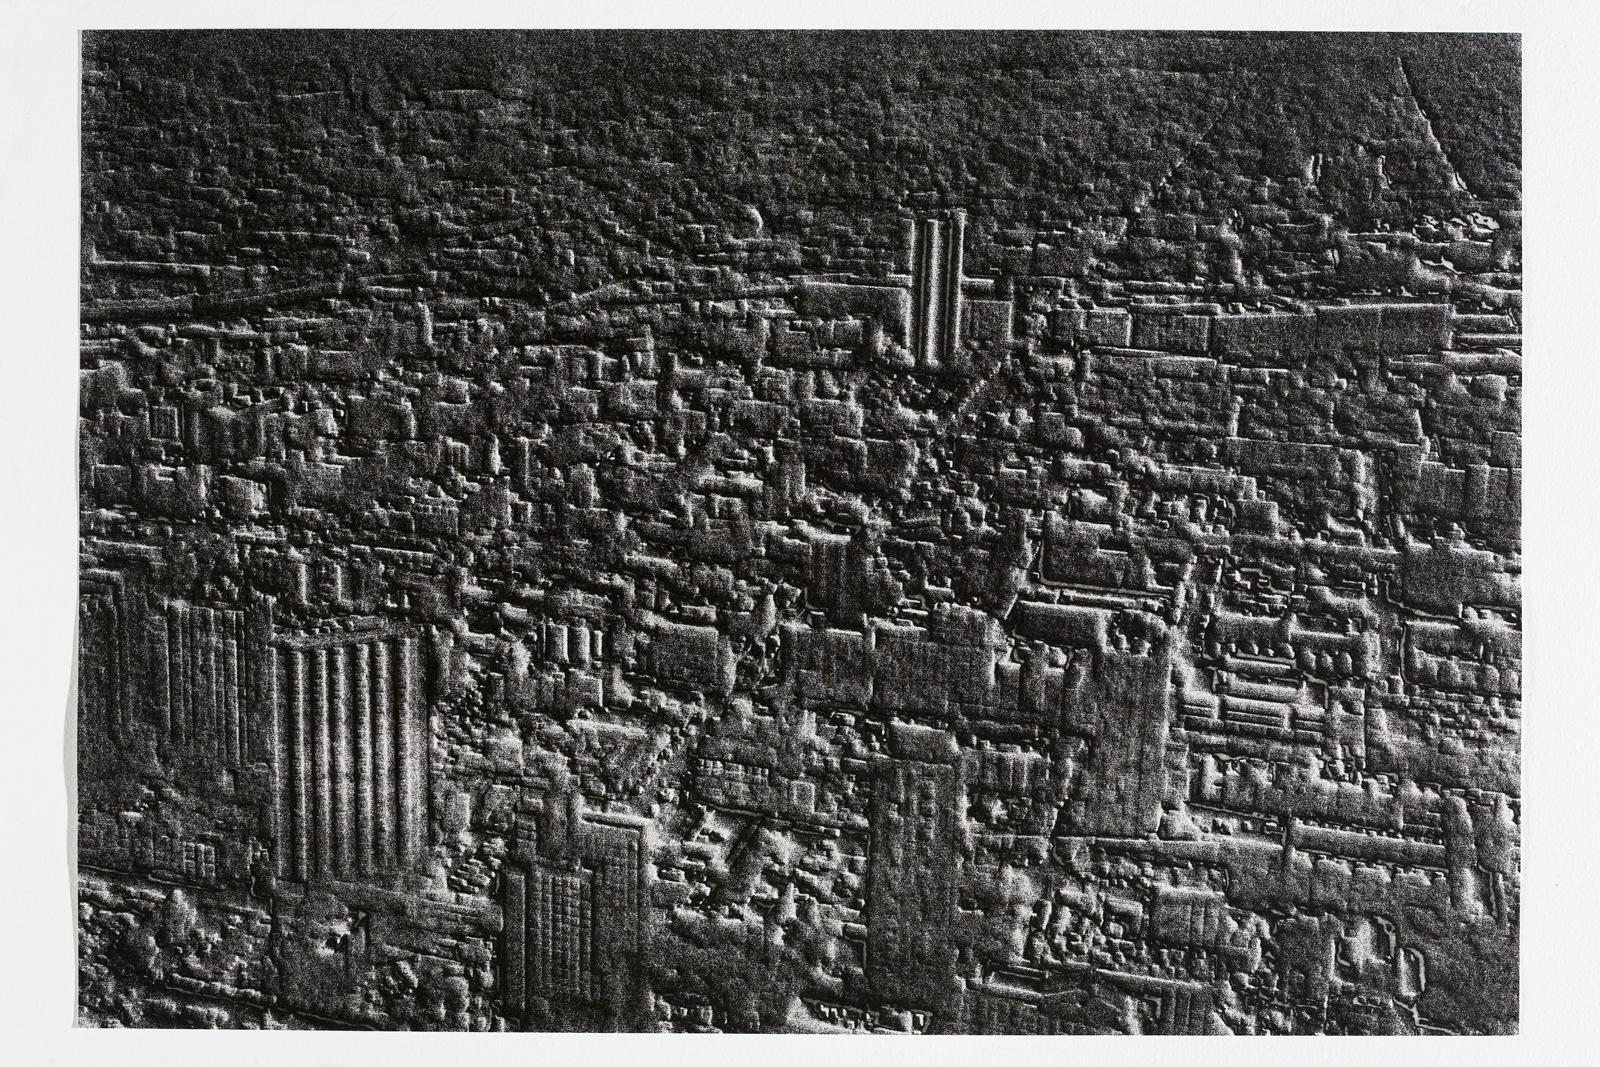 Jane Dixon, Regeneration II (Chicago)    Date:  2007   Size (cm - unframed):  40.5 x 58.5cm  Technique:  Etching   Materials:  Somerset Velvet 300gm   Edition size:  20   Publisher:  The Print Studio   Copyright:  The Artist     P.O.A.